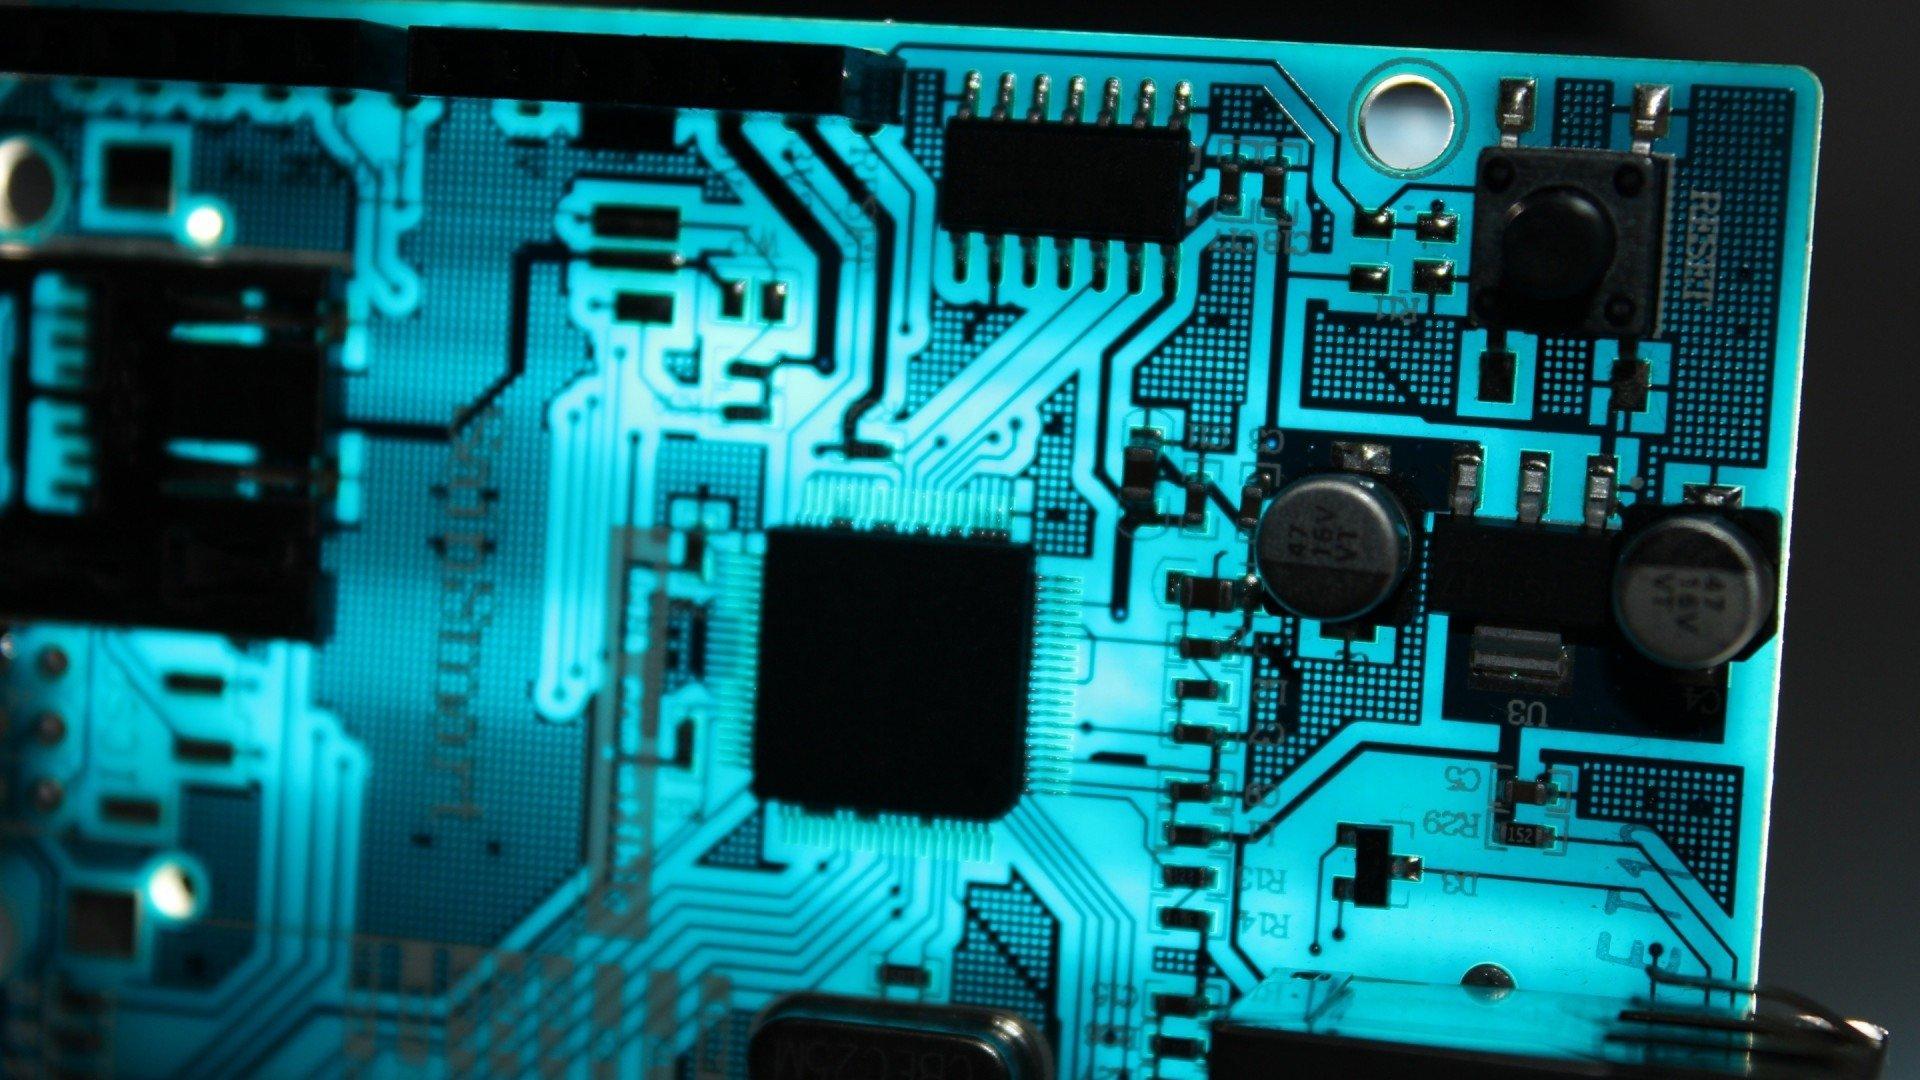 Hd wallpaper electronics - Hd Wallpaper Background Id 447888